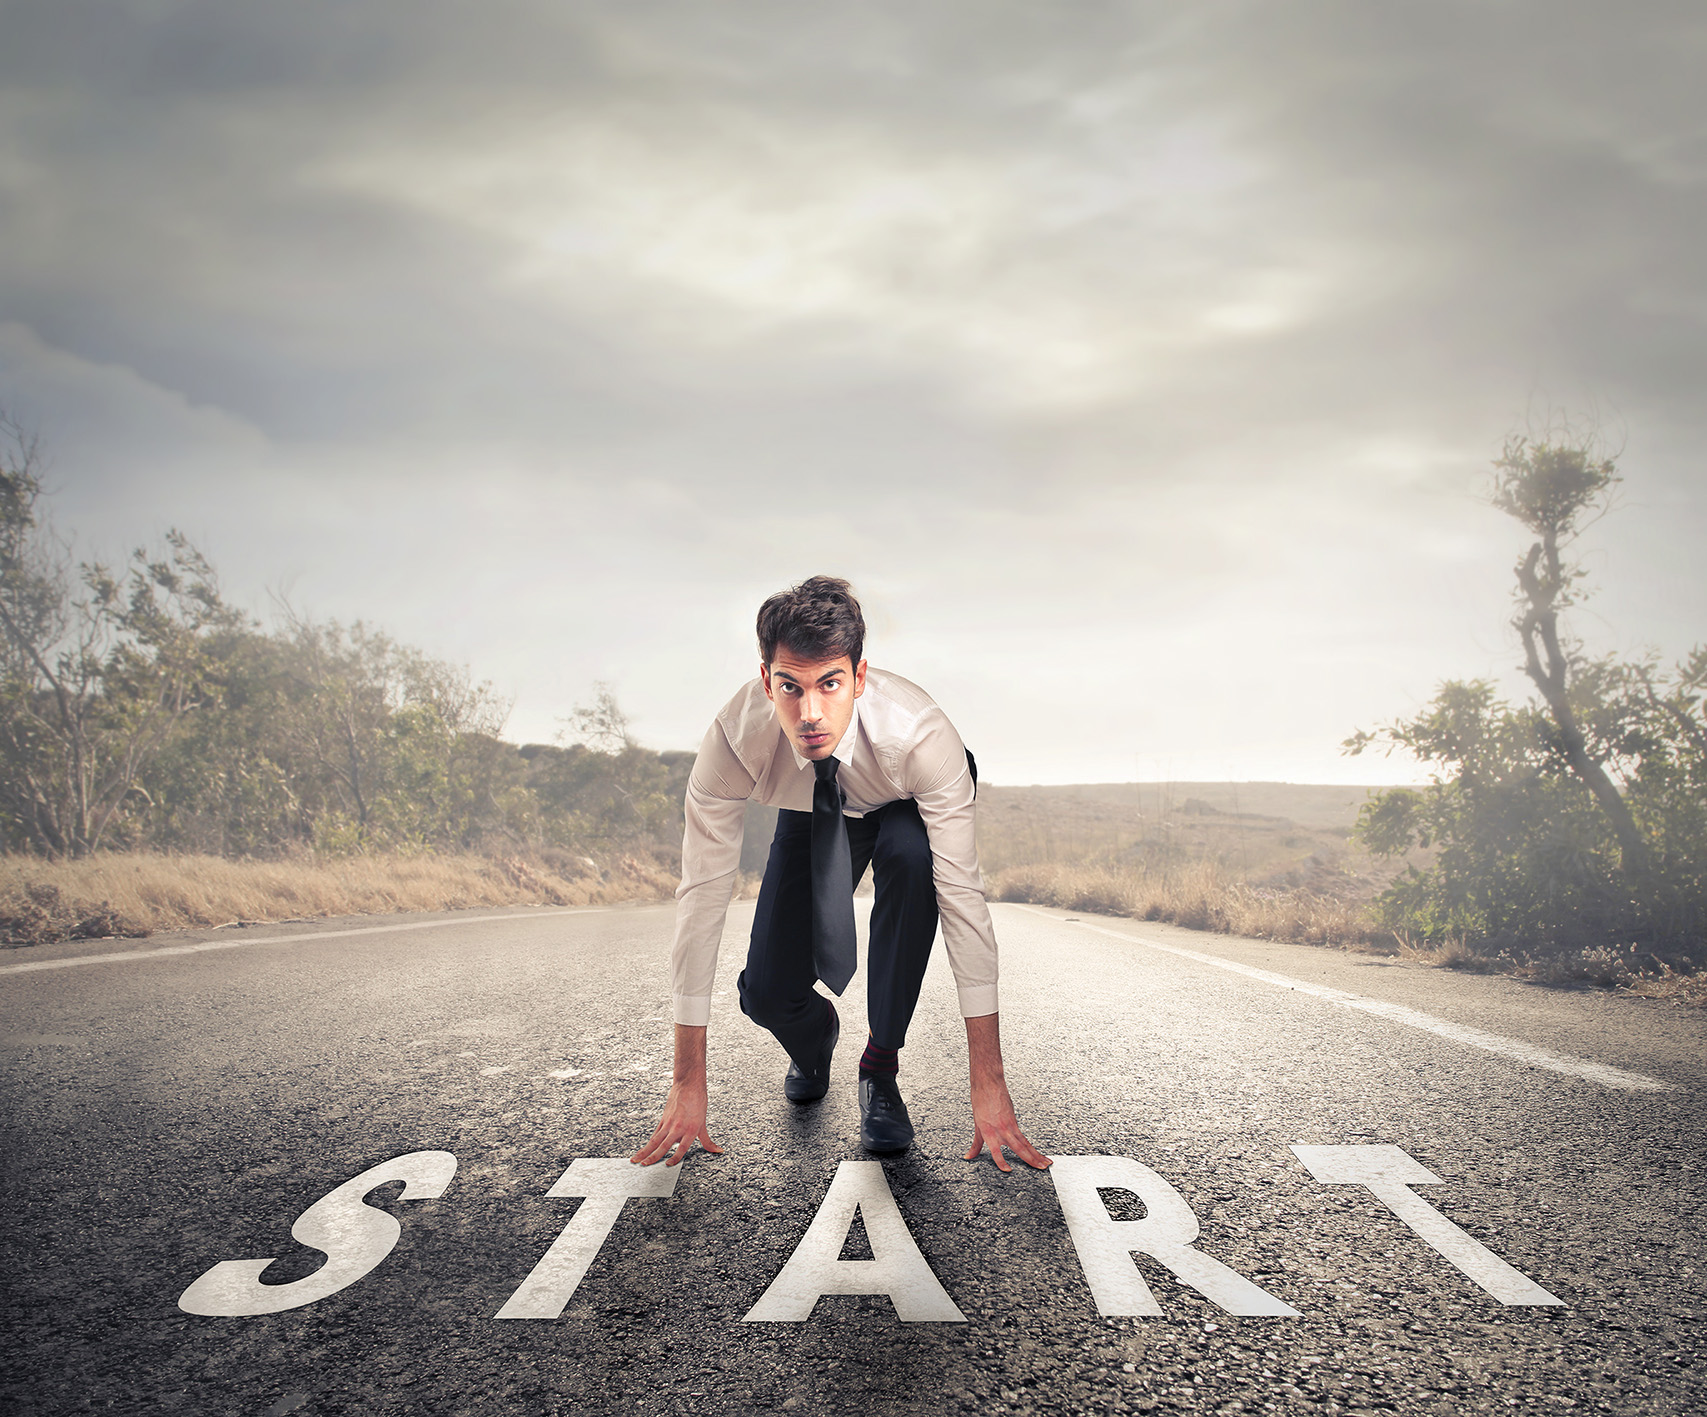 eerste-werkdag-start-van-je-carriere